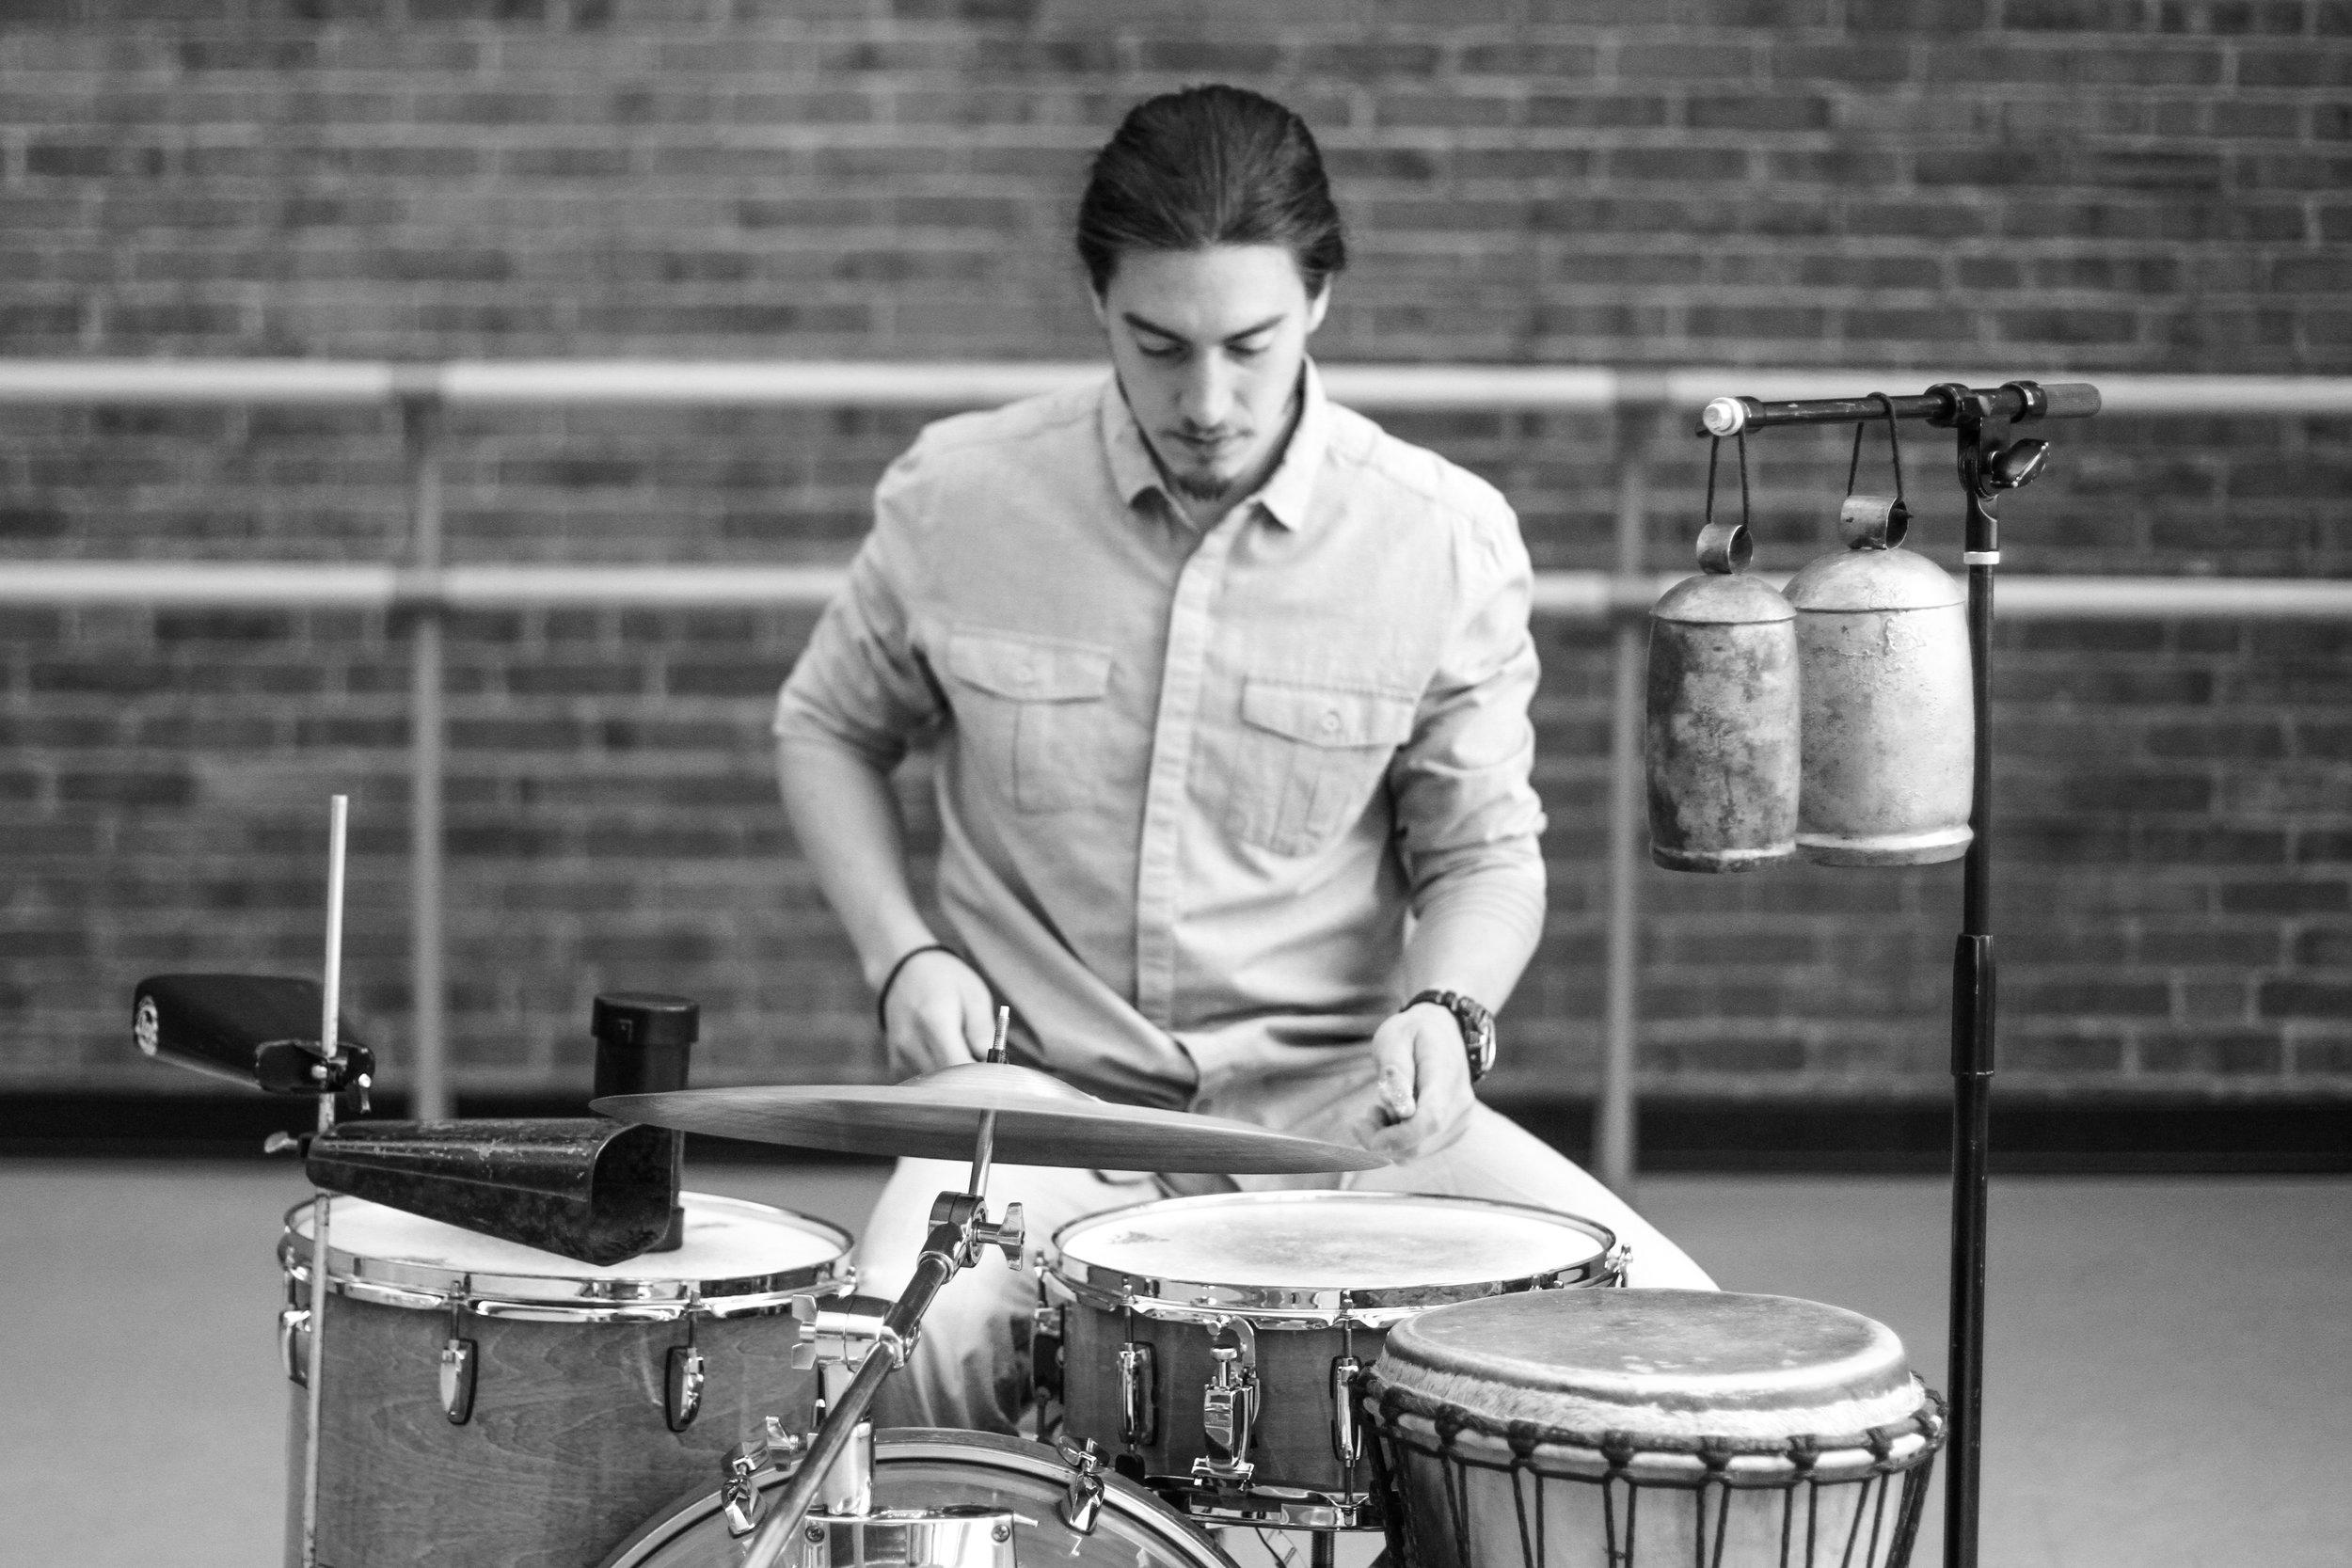 PJ Roduta - Composer/Musician